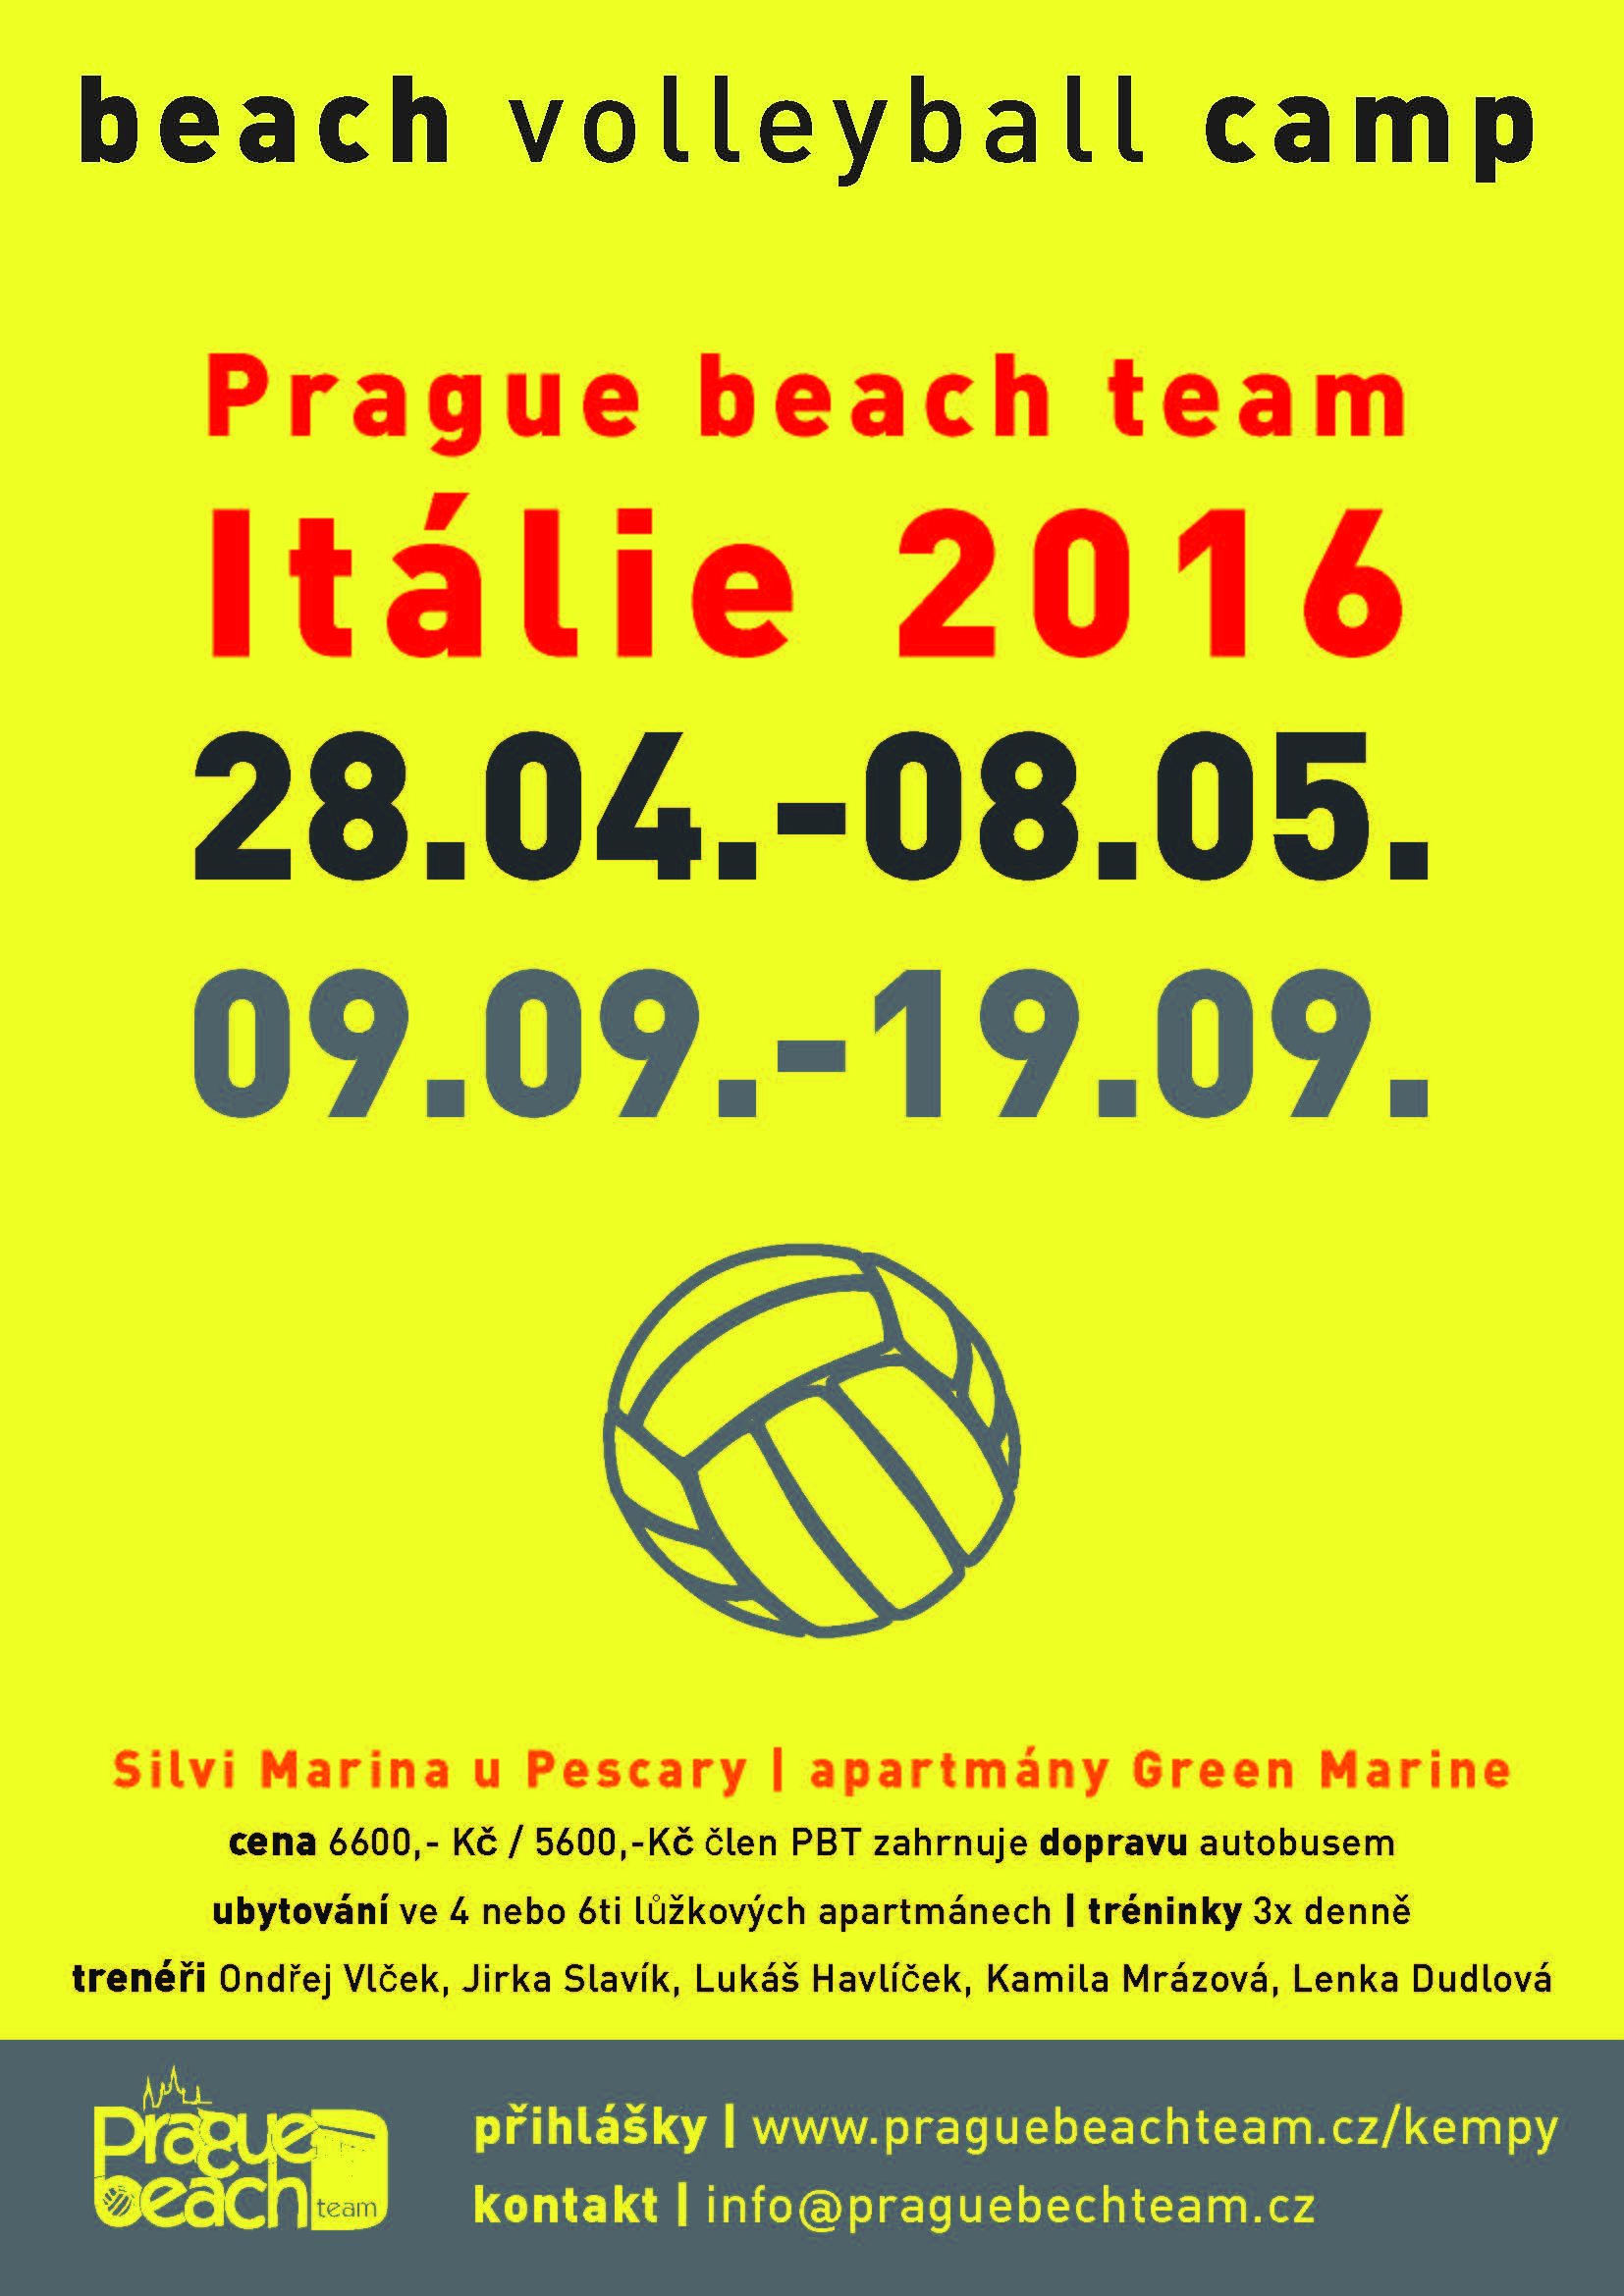 Itálie 2016 Prague beach team